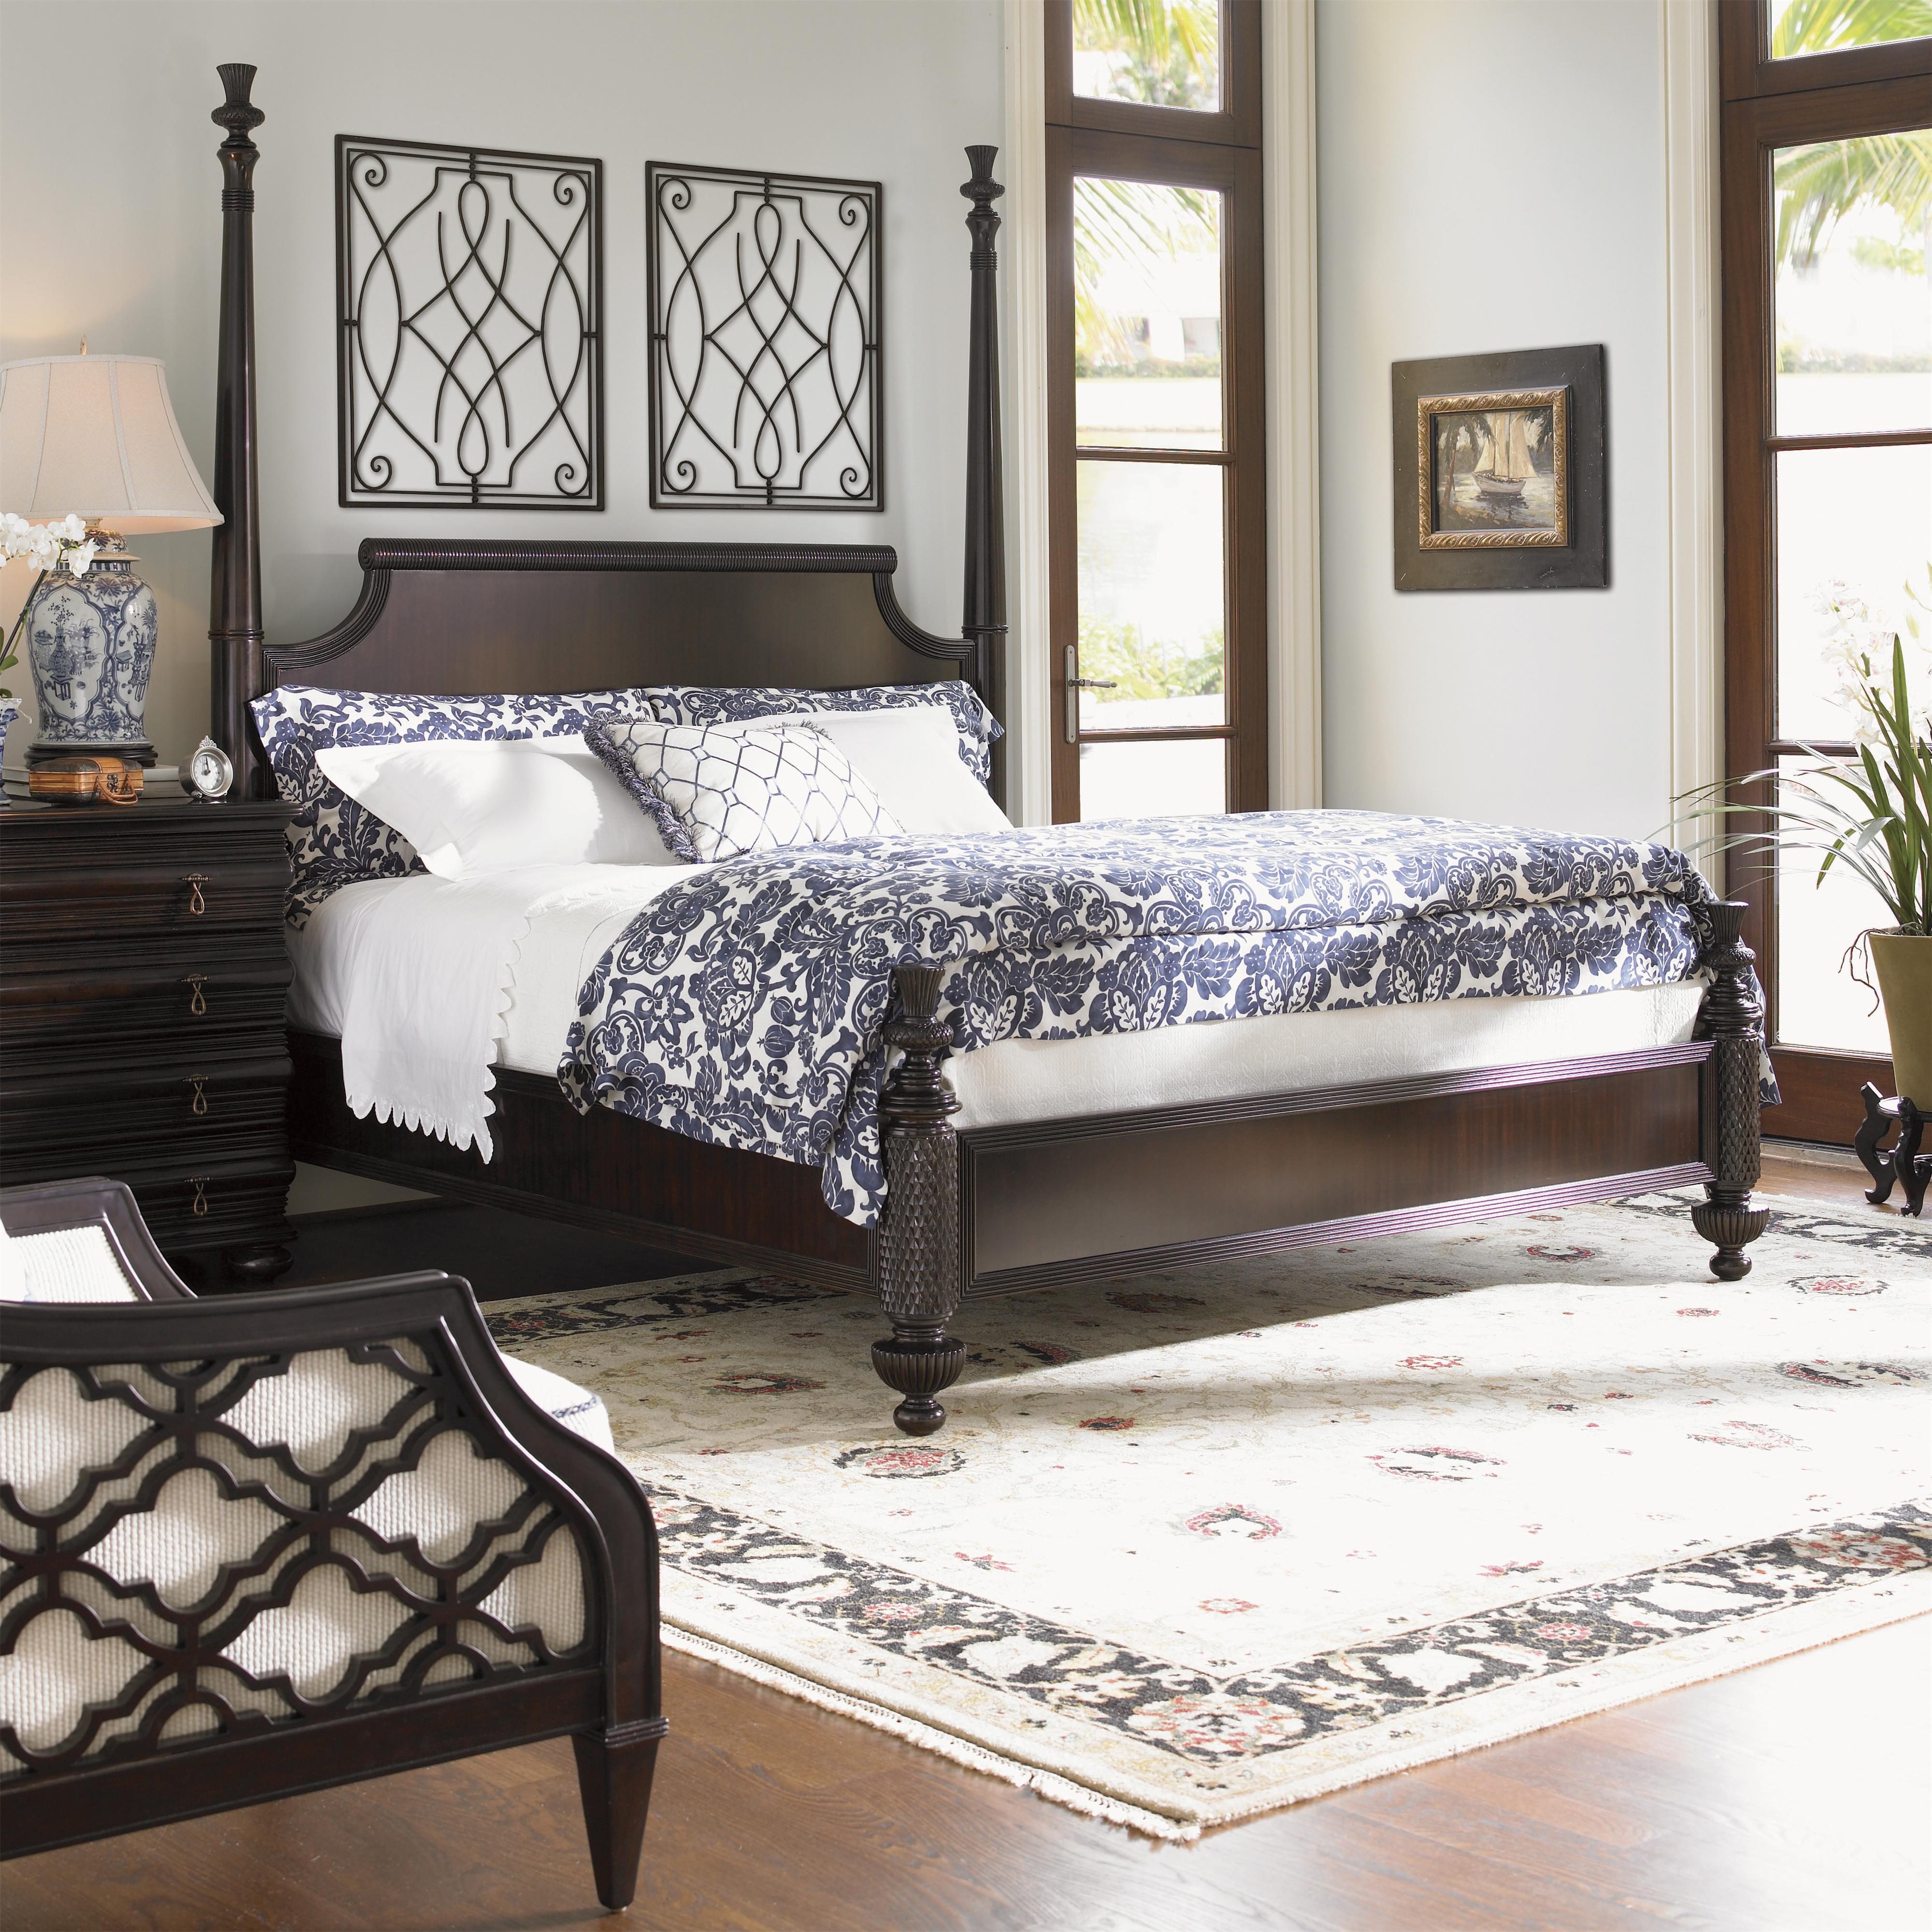 Tommy Bahama Home Royal Kahala King Bedroom Group Reeds Furniture Bedroom Groups